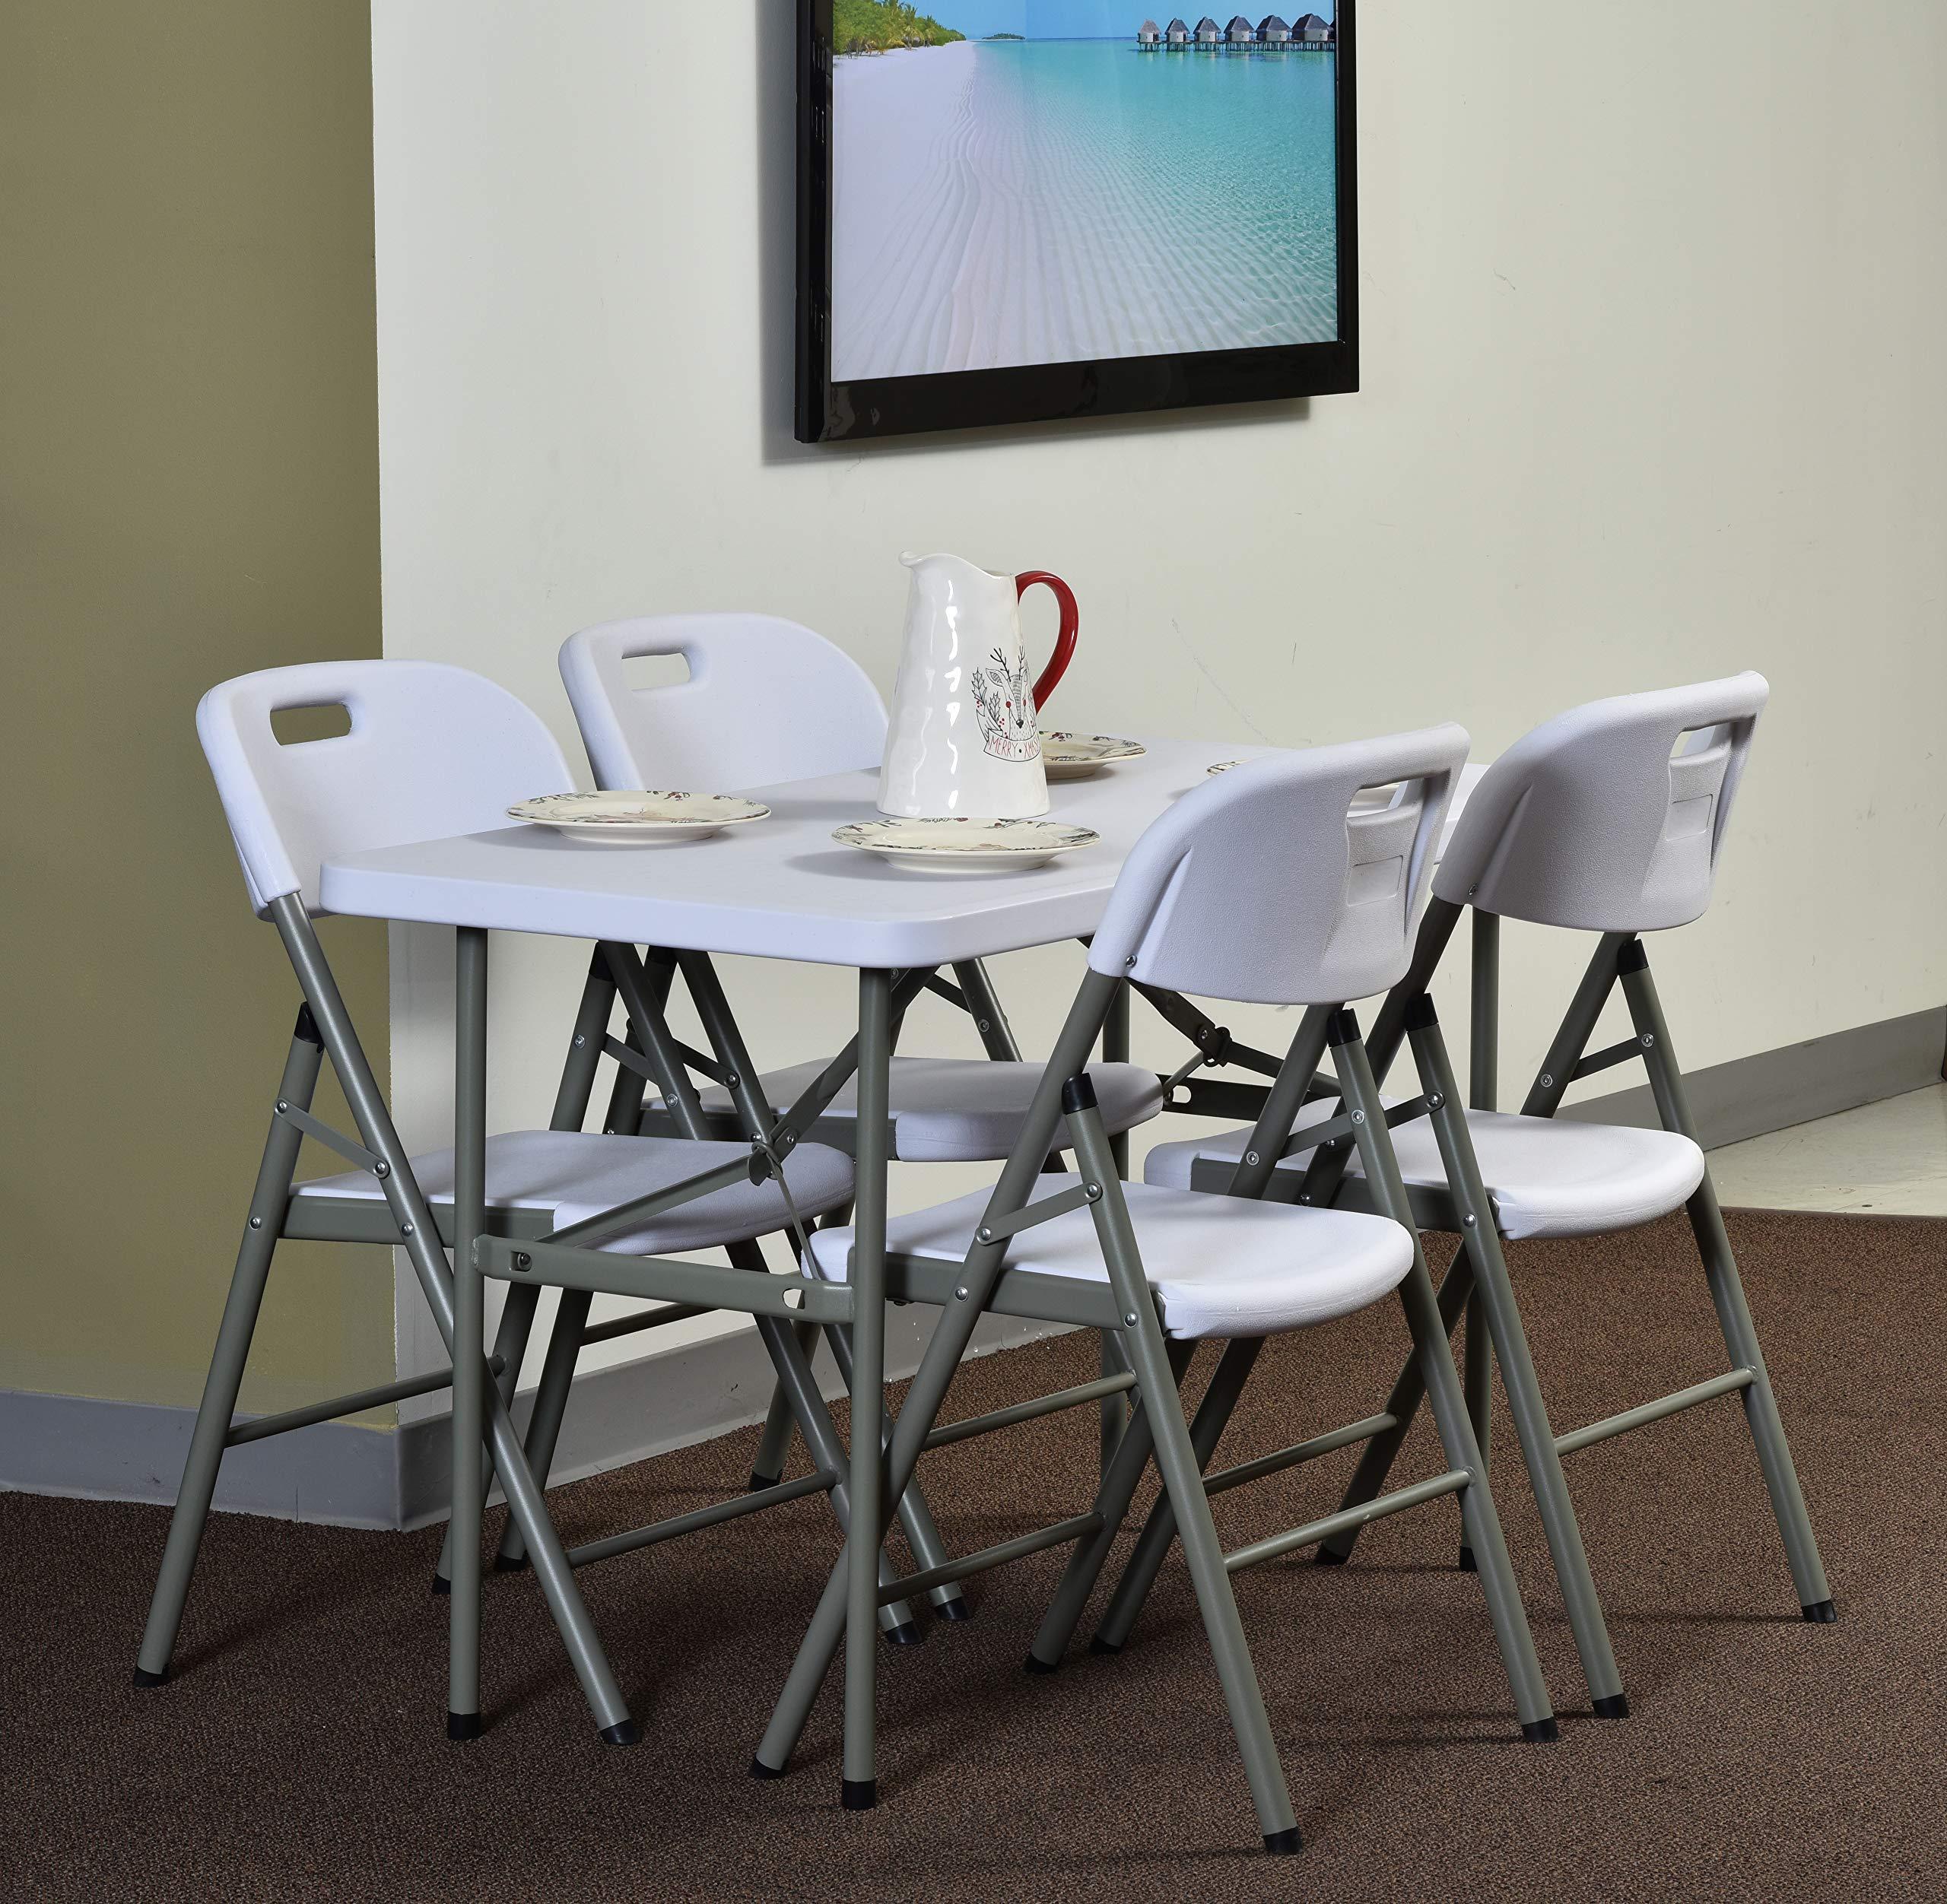 Sandusky Lee PT4824-WV2 Commercial Folding Utility Table, 4', White, 29'' Height, 48'' Width, 24'' Length by Sandusky